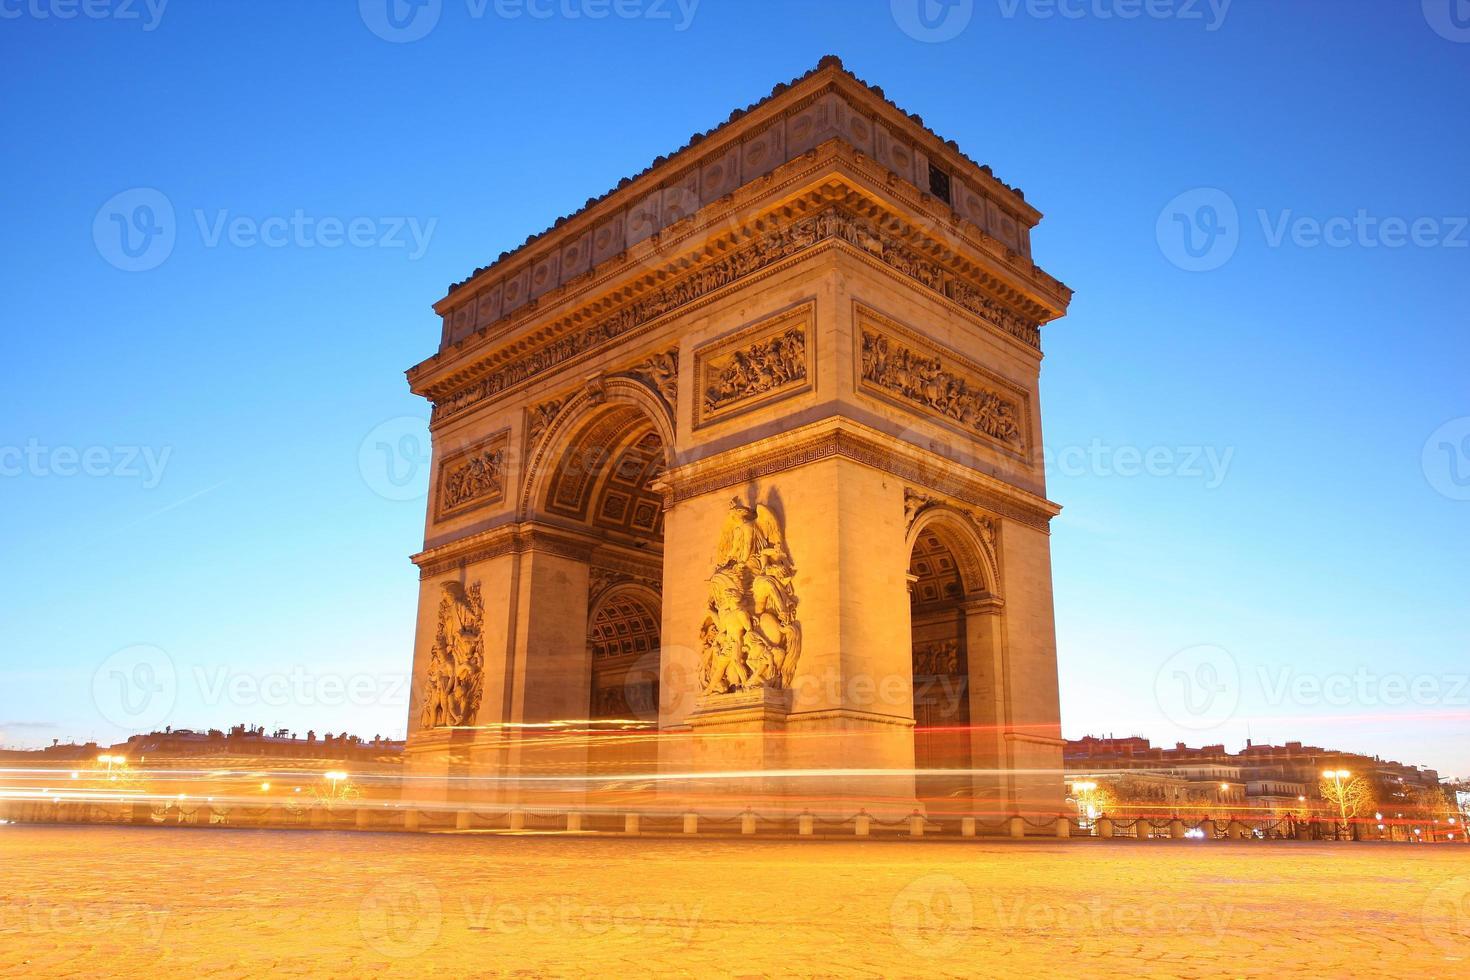 berömd Arc de Triomphe på kvällen, Paris, Frankrike foto